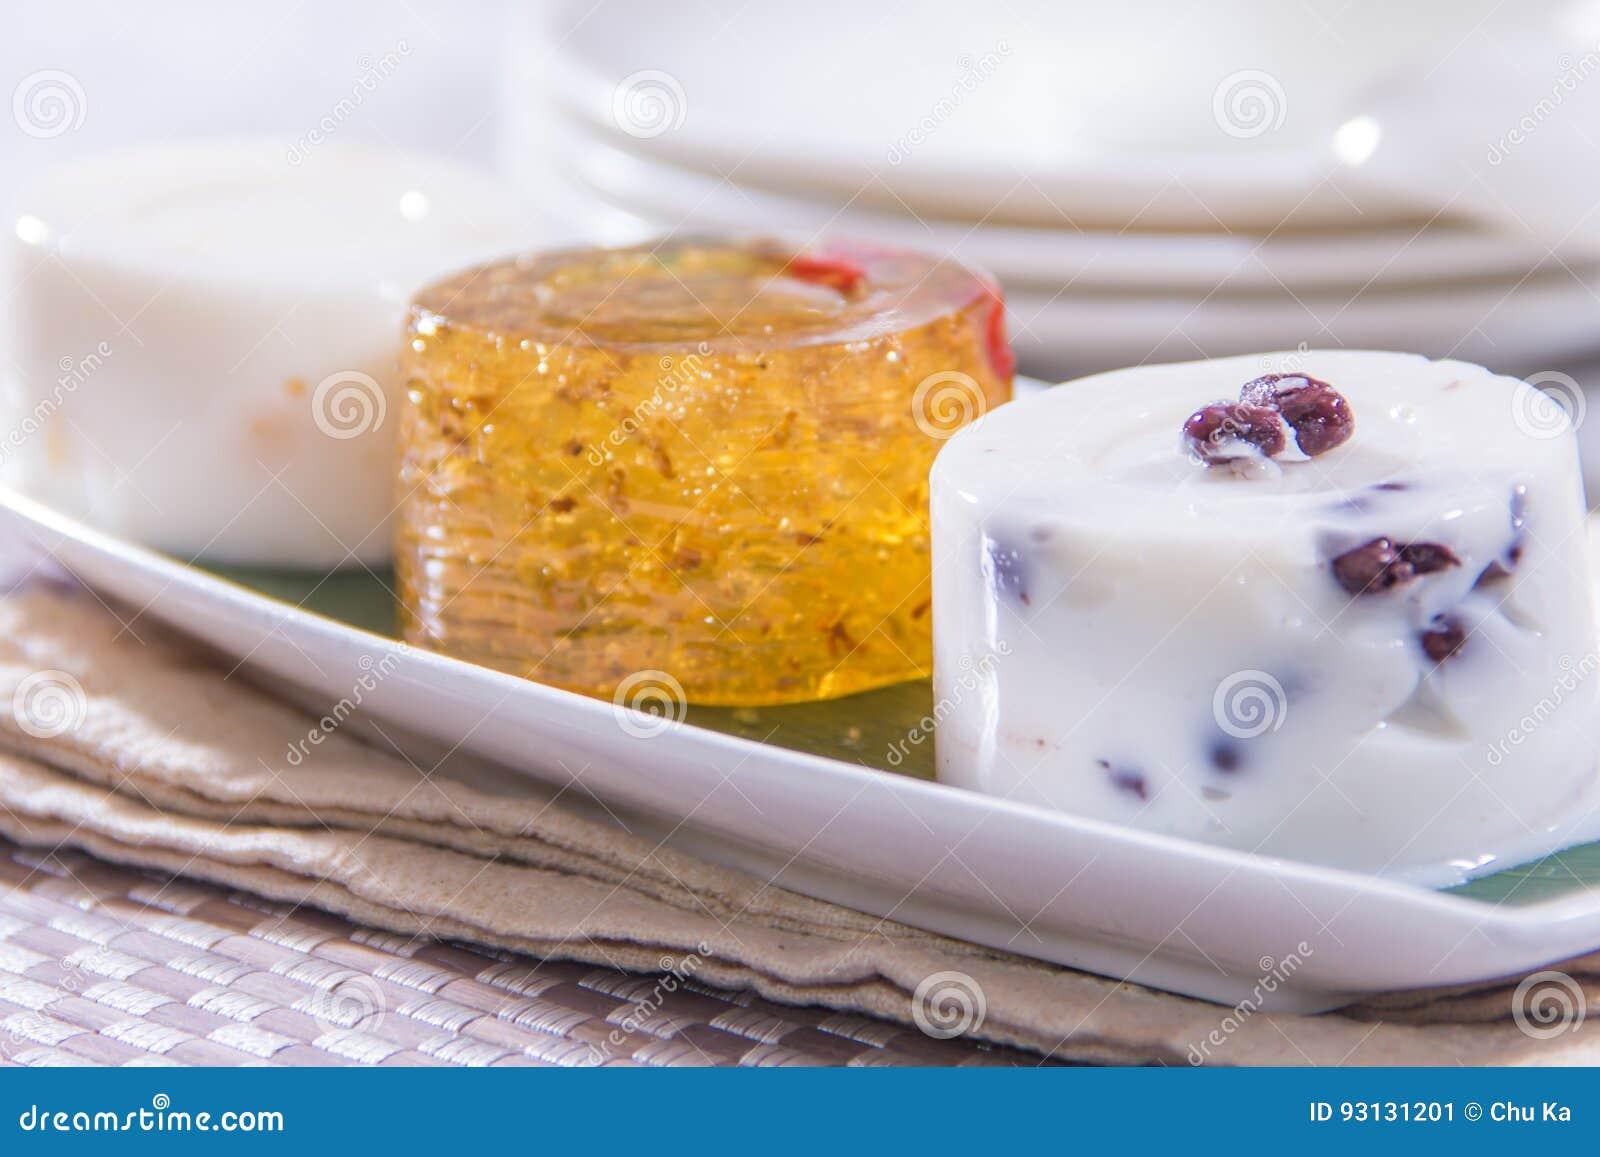 A tasty cuisine photo of dessert